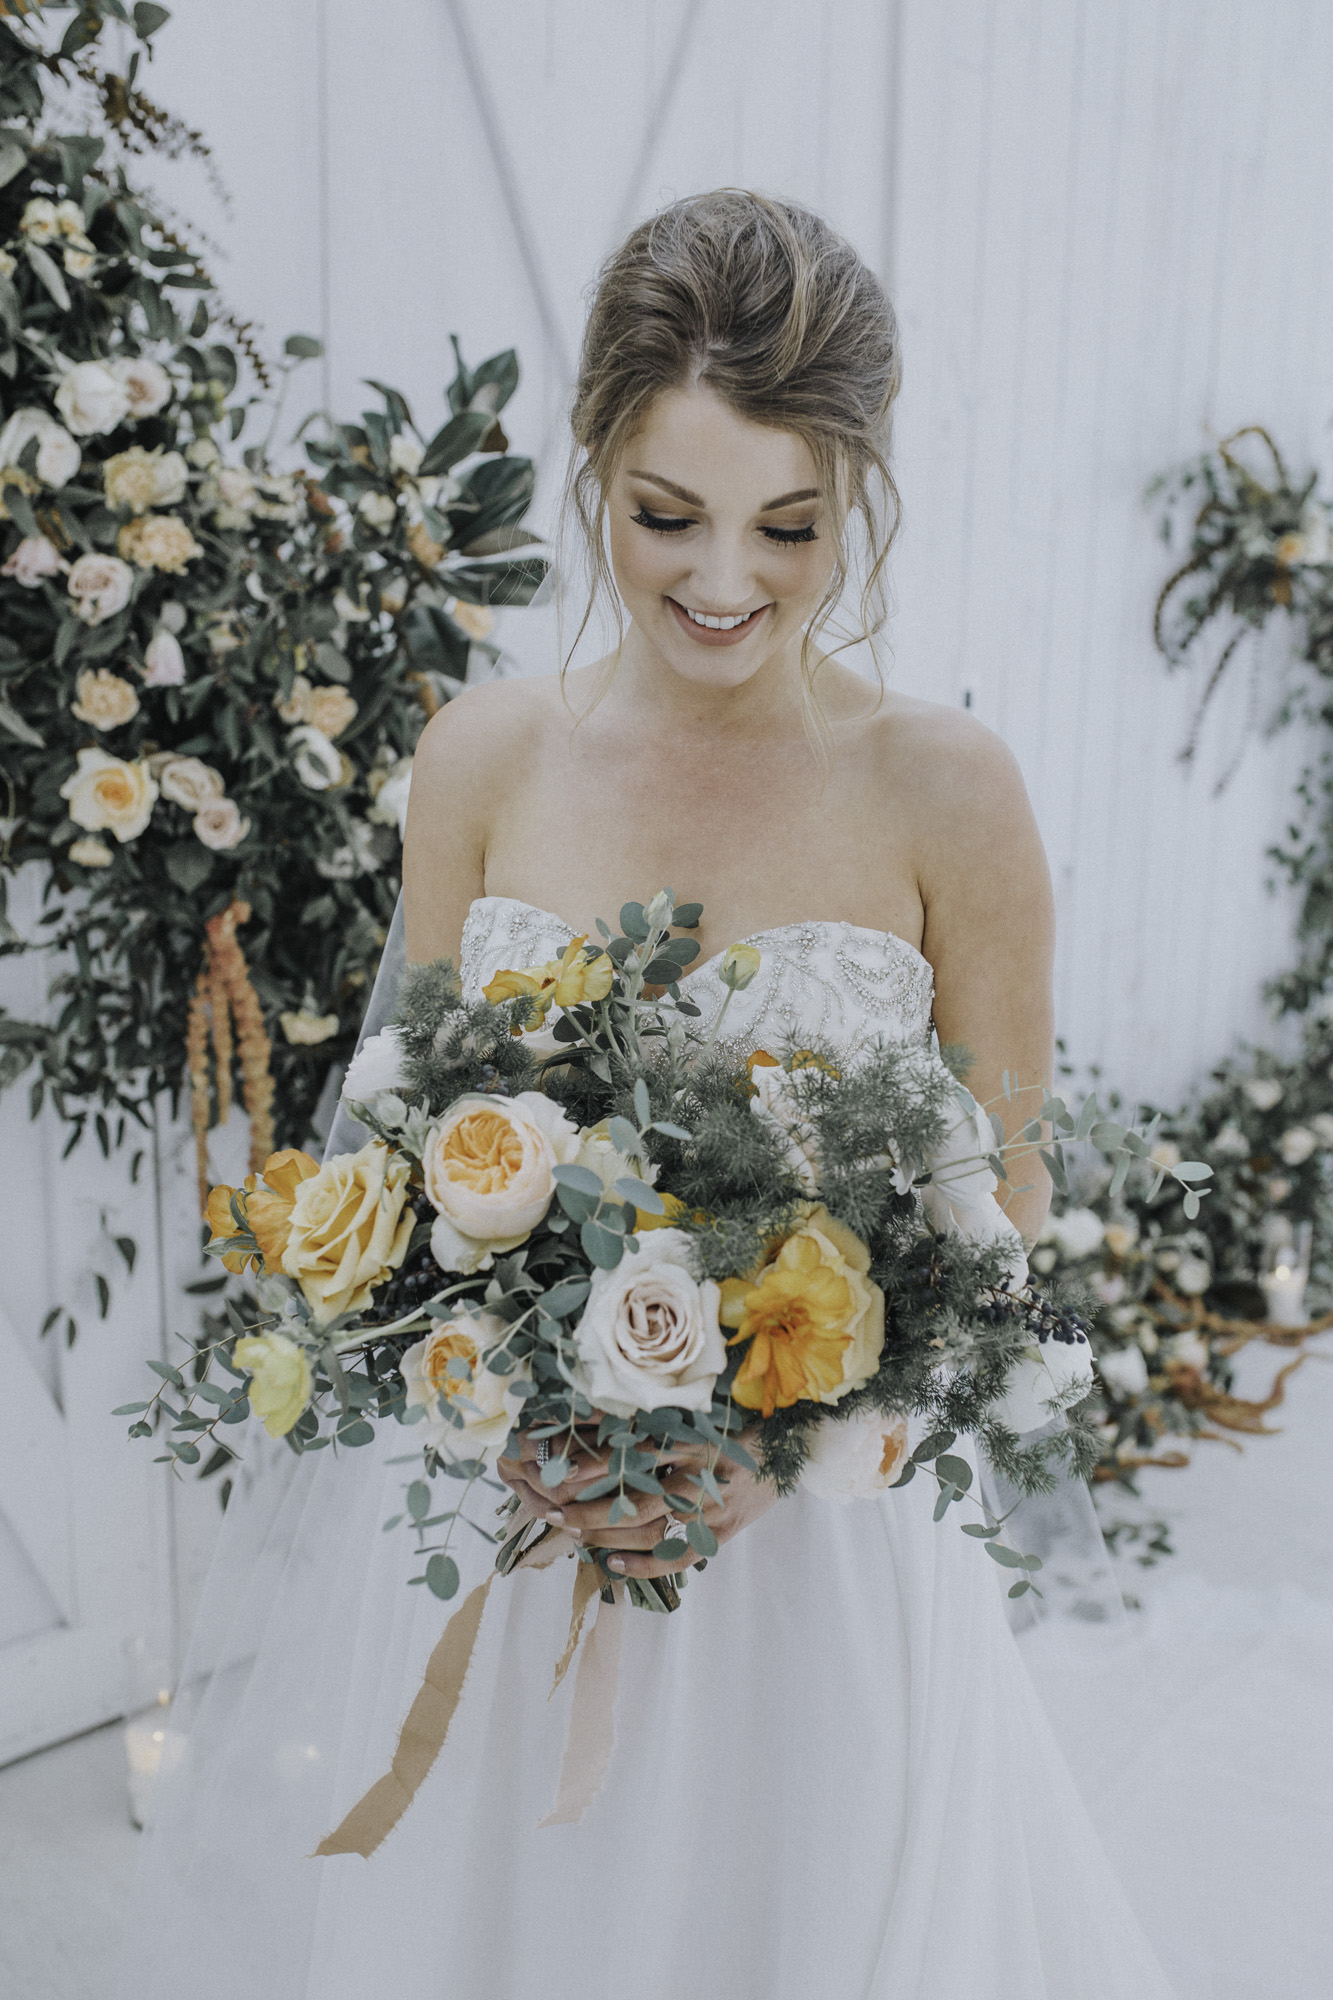 Cate_Ann_Photography_Dayton_Ohio_Wedding_Elopement_And_Engagement_PhotographerIMG_7936.jpg